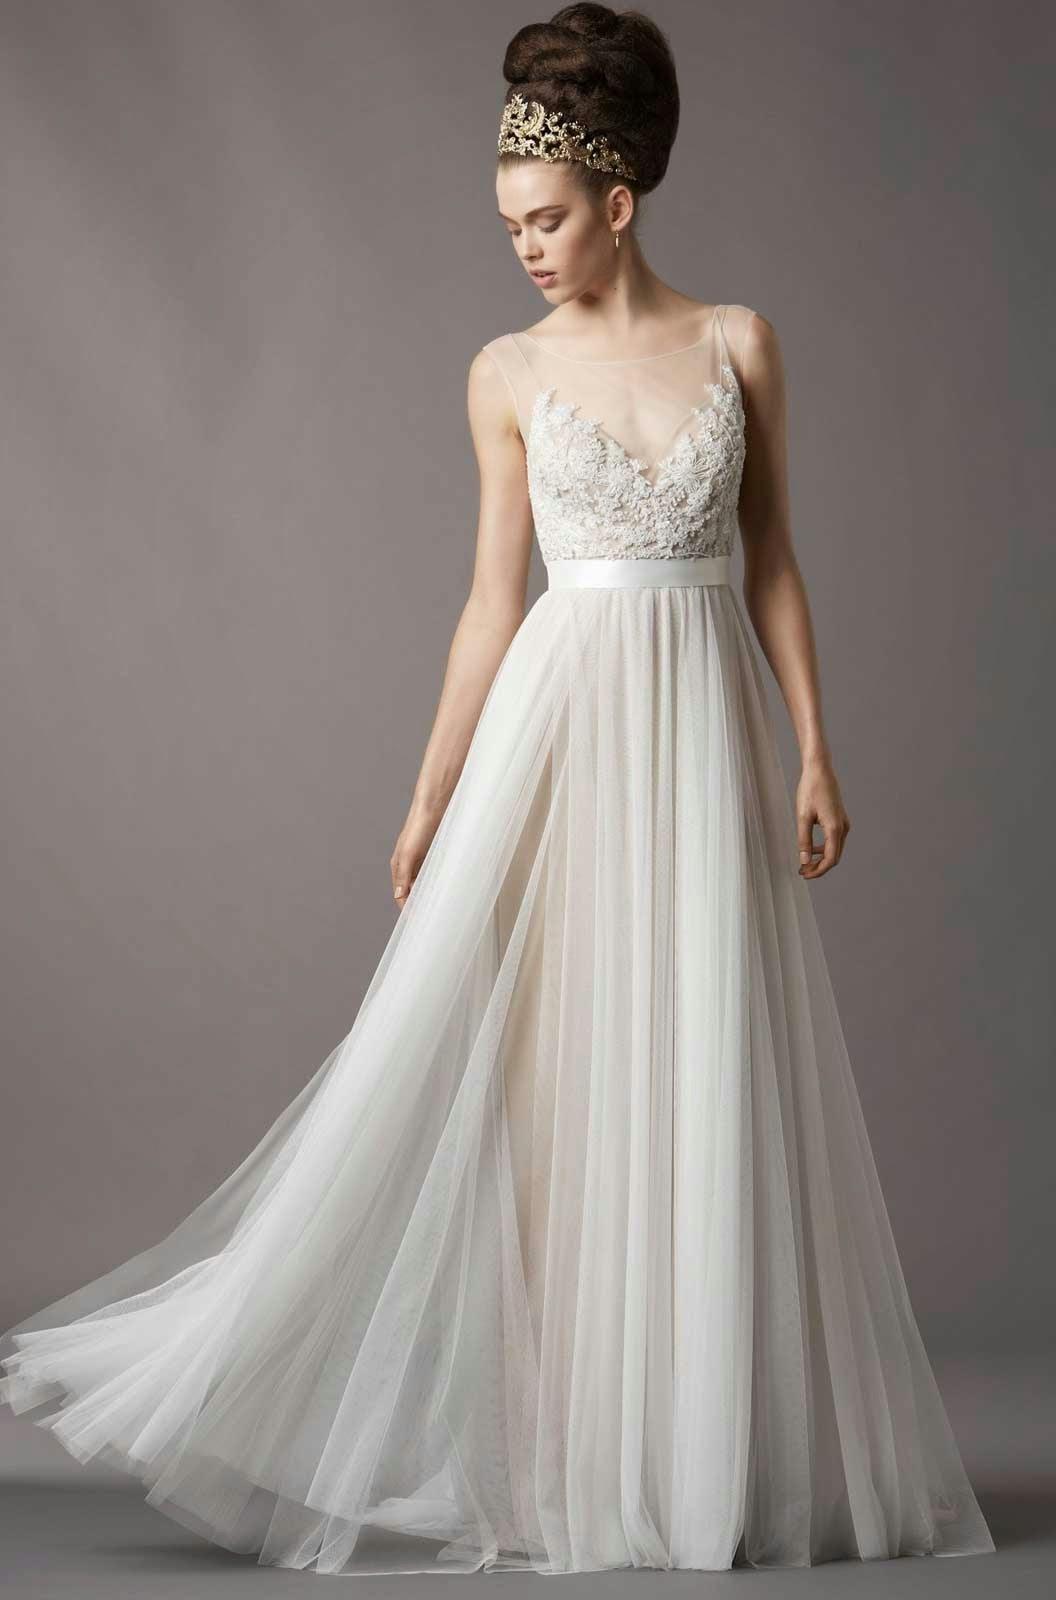 Modern Wedding Dresses Wonderful Photos HD Concept Ideas